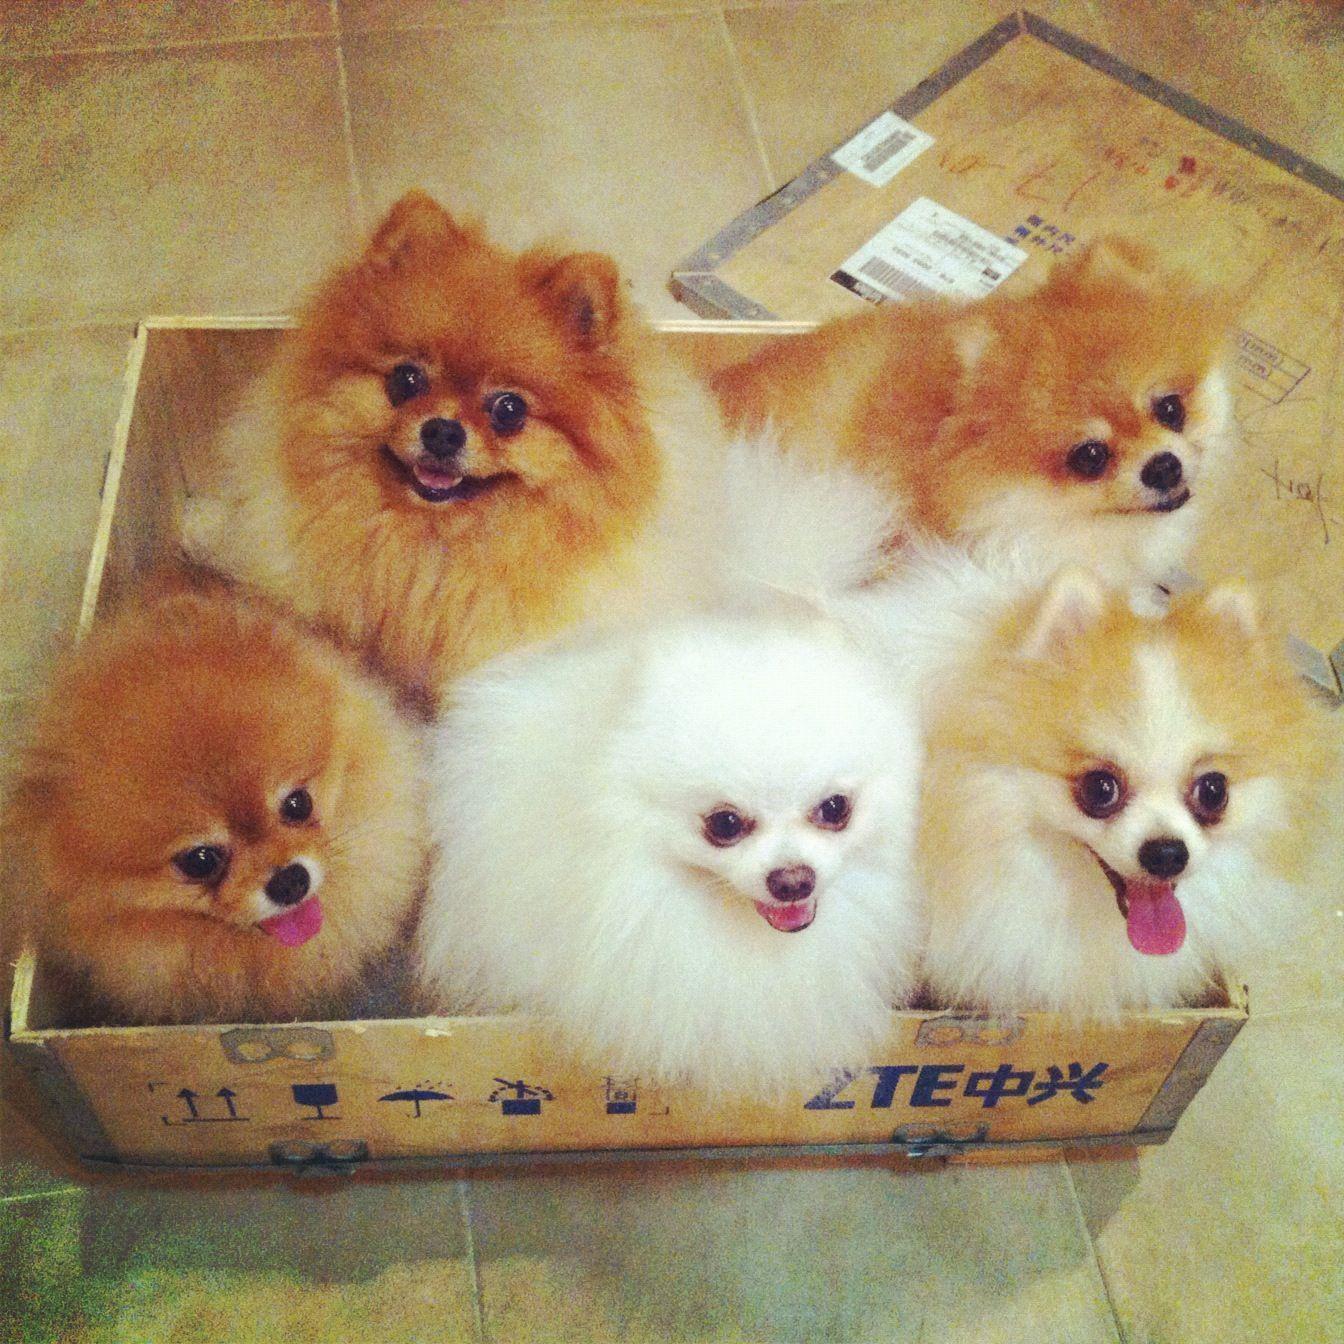 Ready To Go Dogs Pets Pomeranians Puppies Facebook Com Sodoggonefunny Pomeranian Puppy Dogs Cute Animals